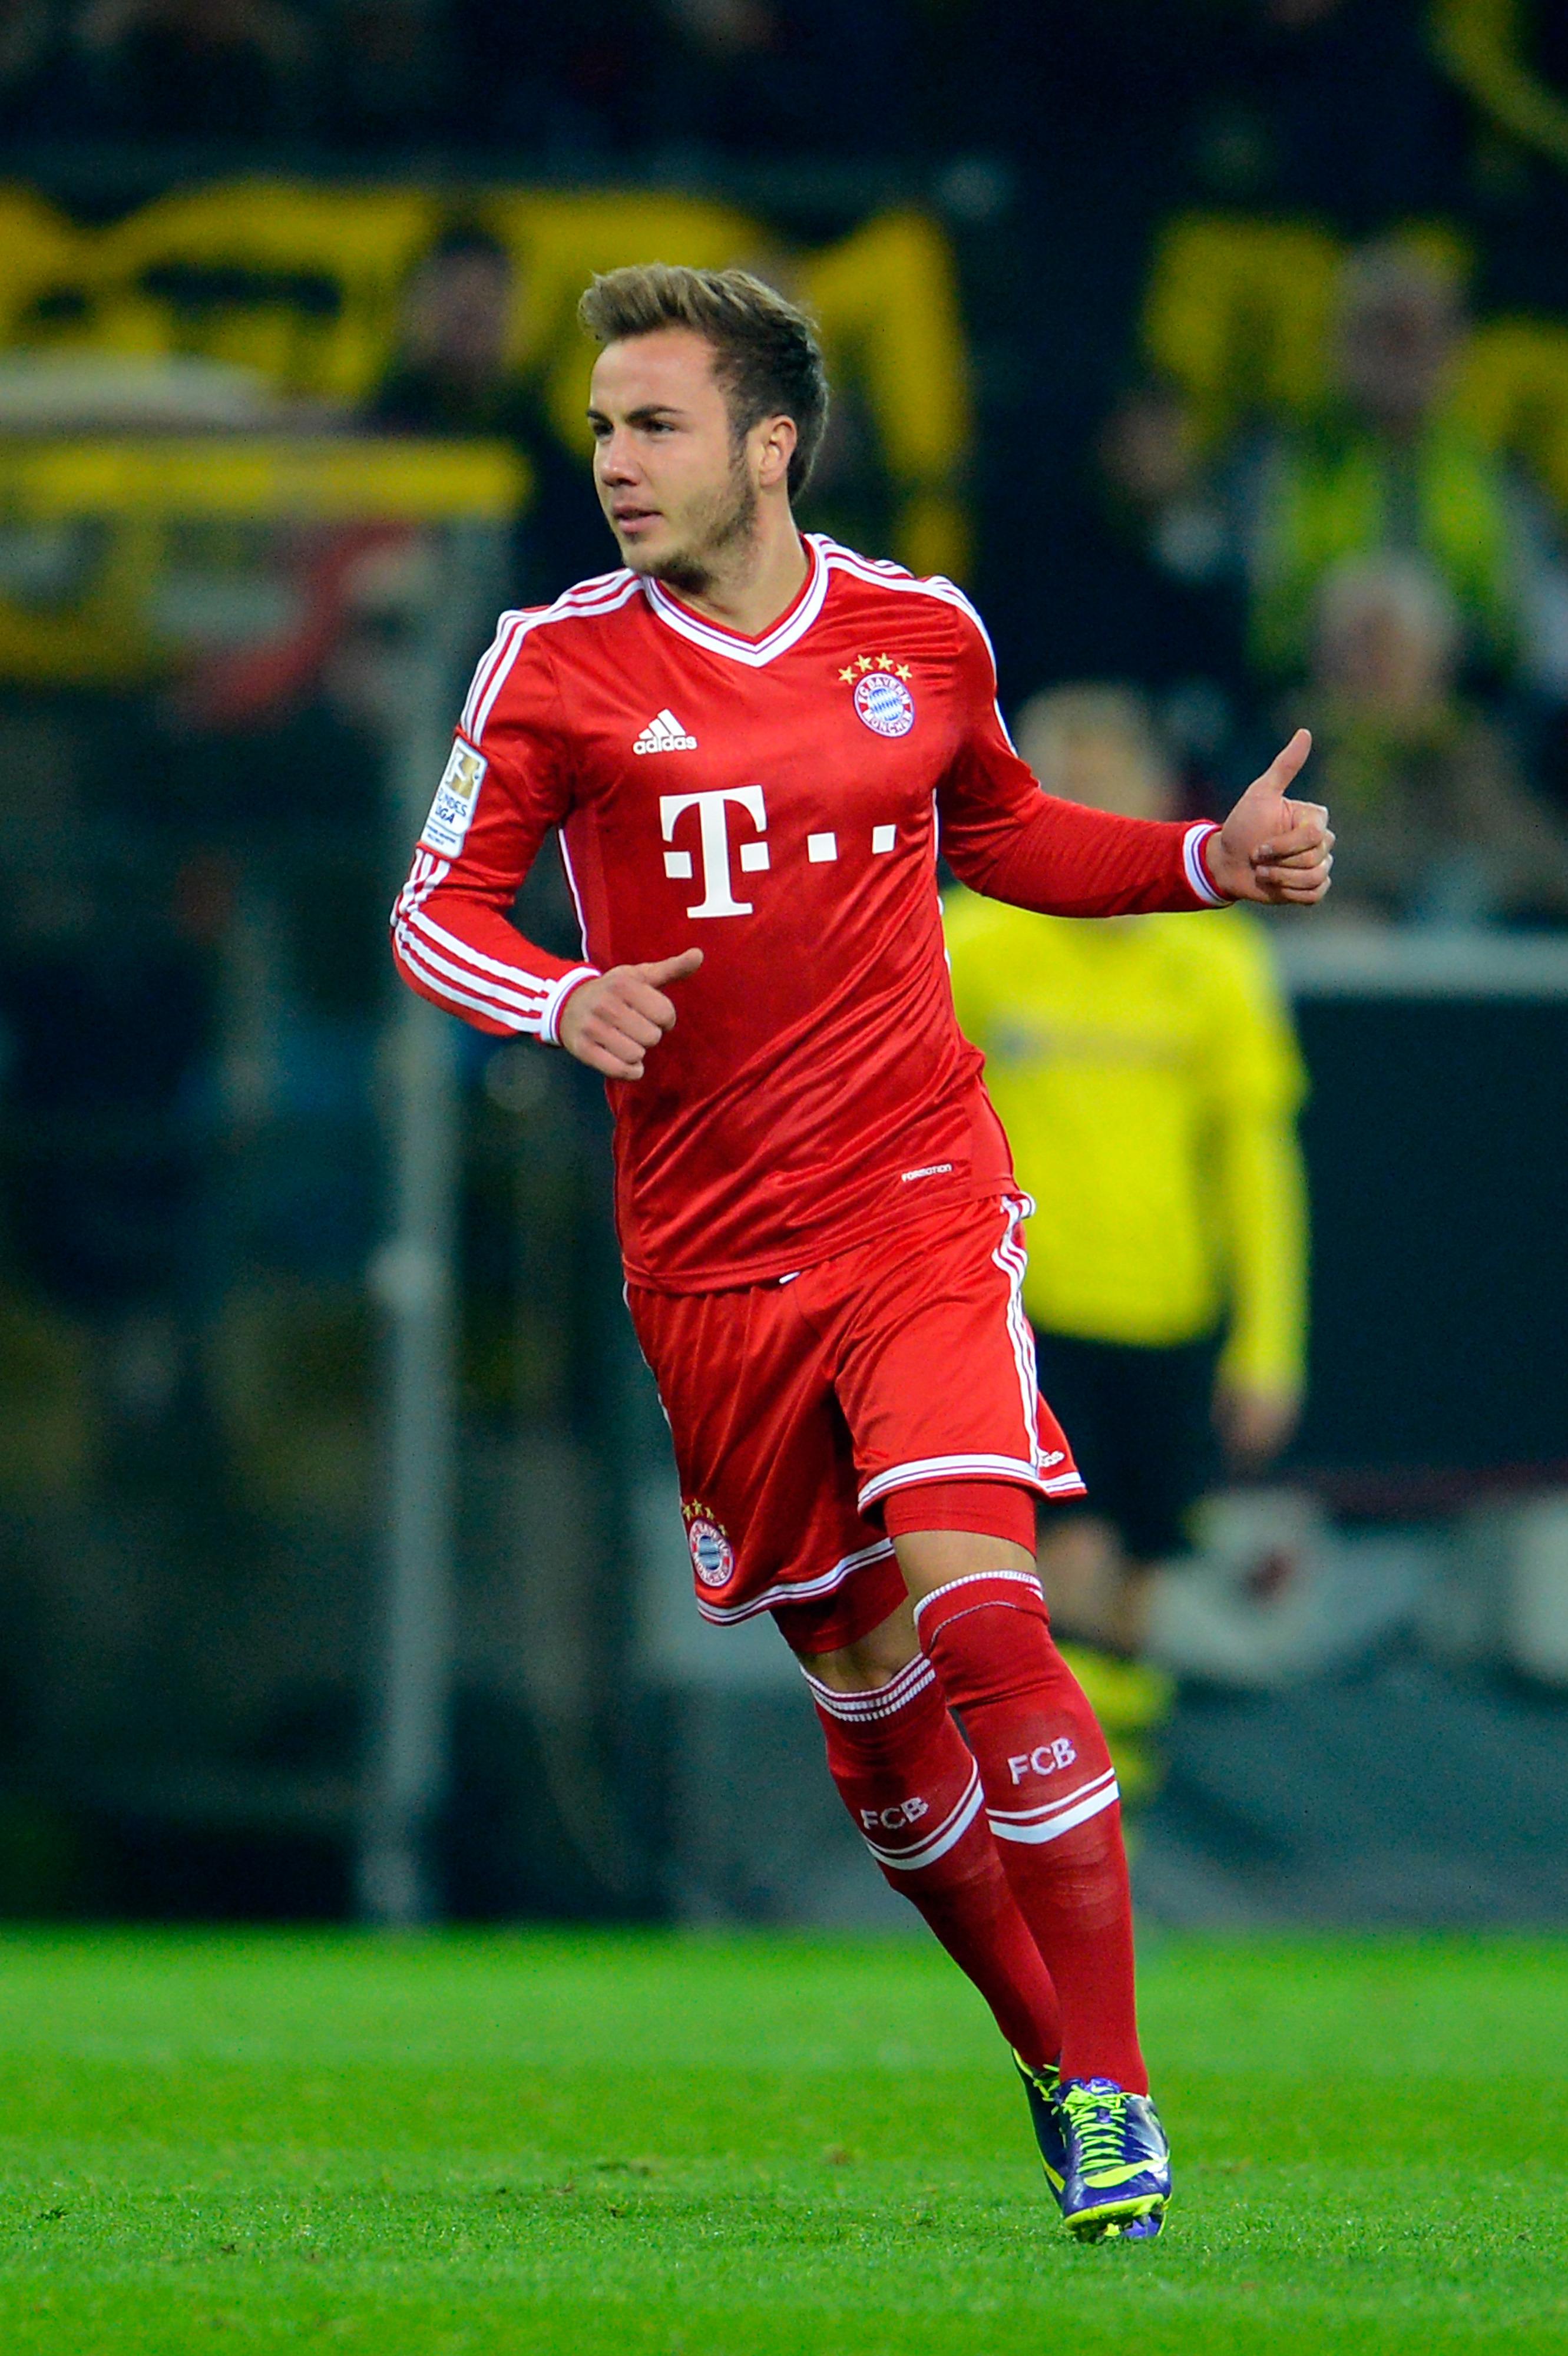 Borussia Dortmund vs. Bayern Munich: Final score 0-3, Mario Götze sinks his former club